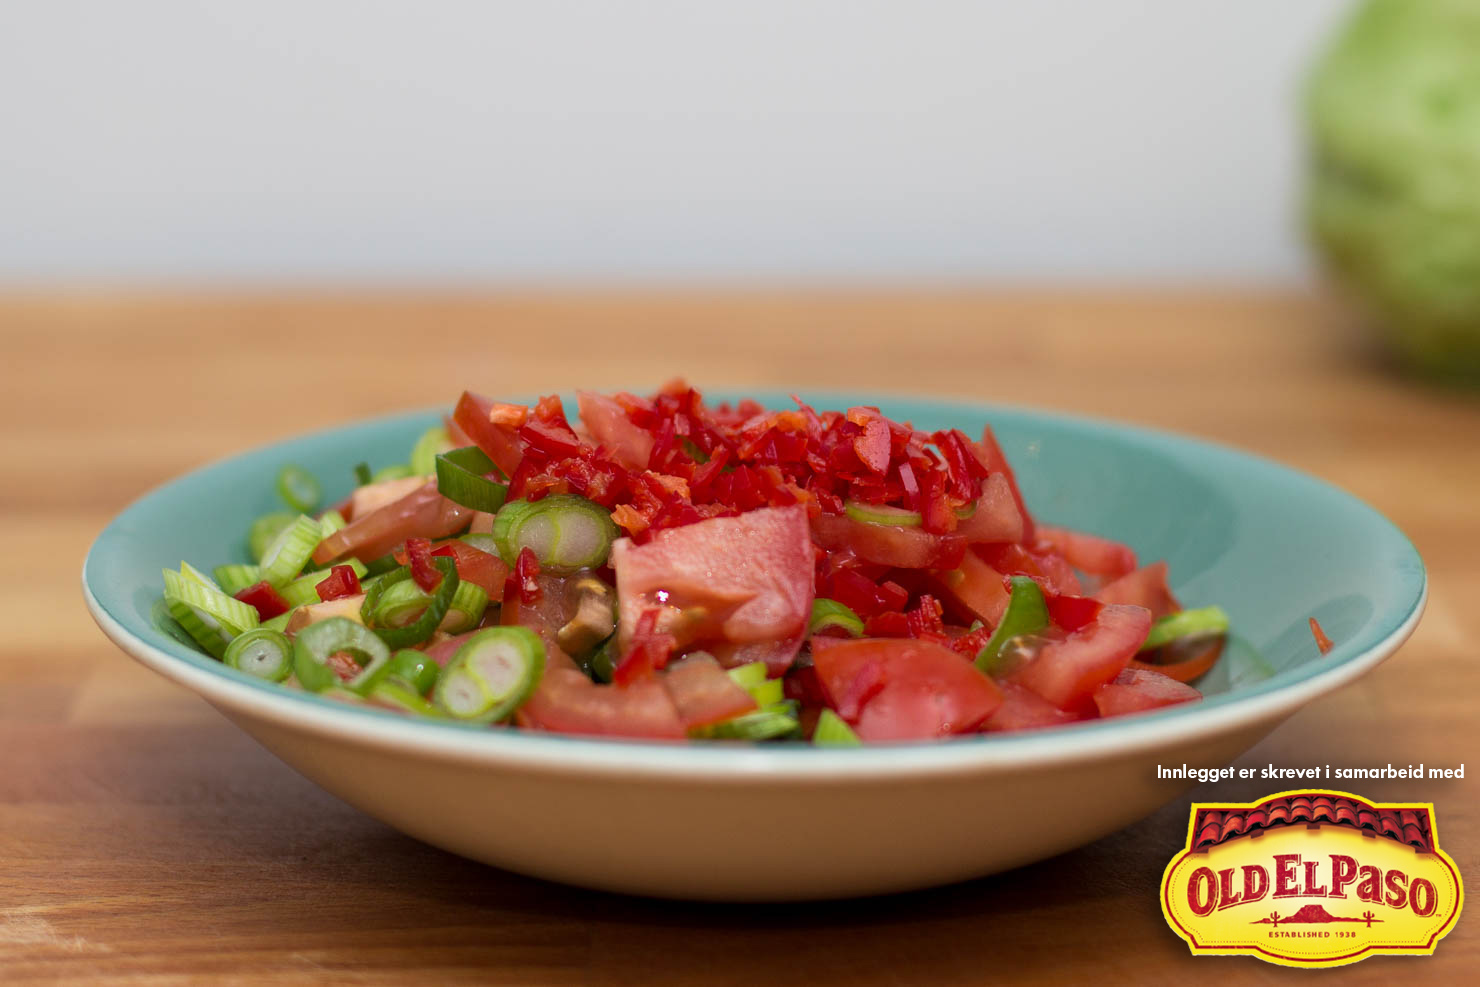 Salsa | Chicken tinga | Old El Paso